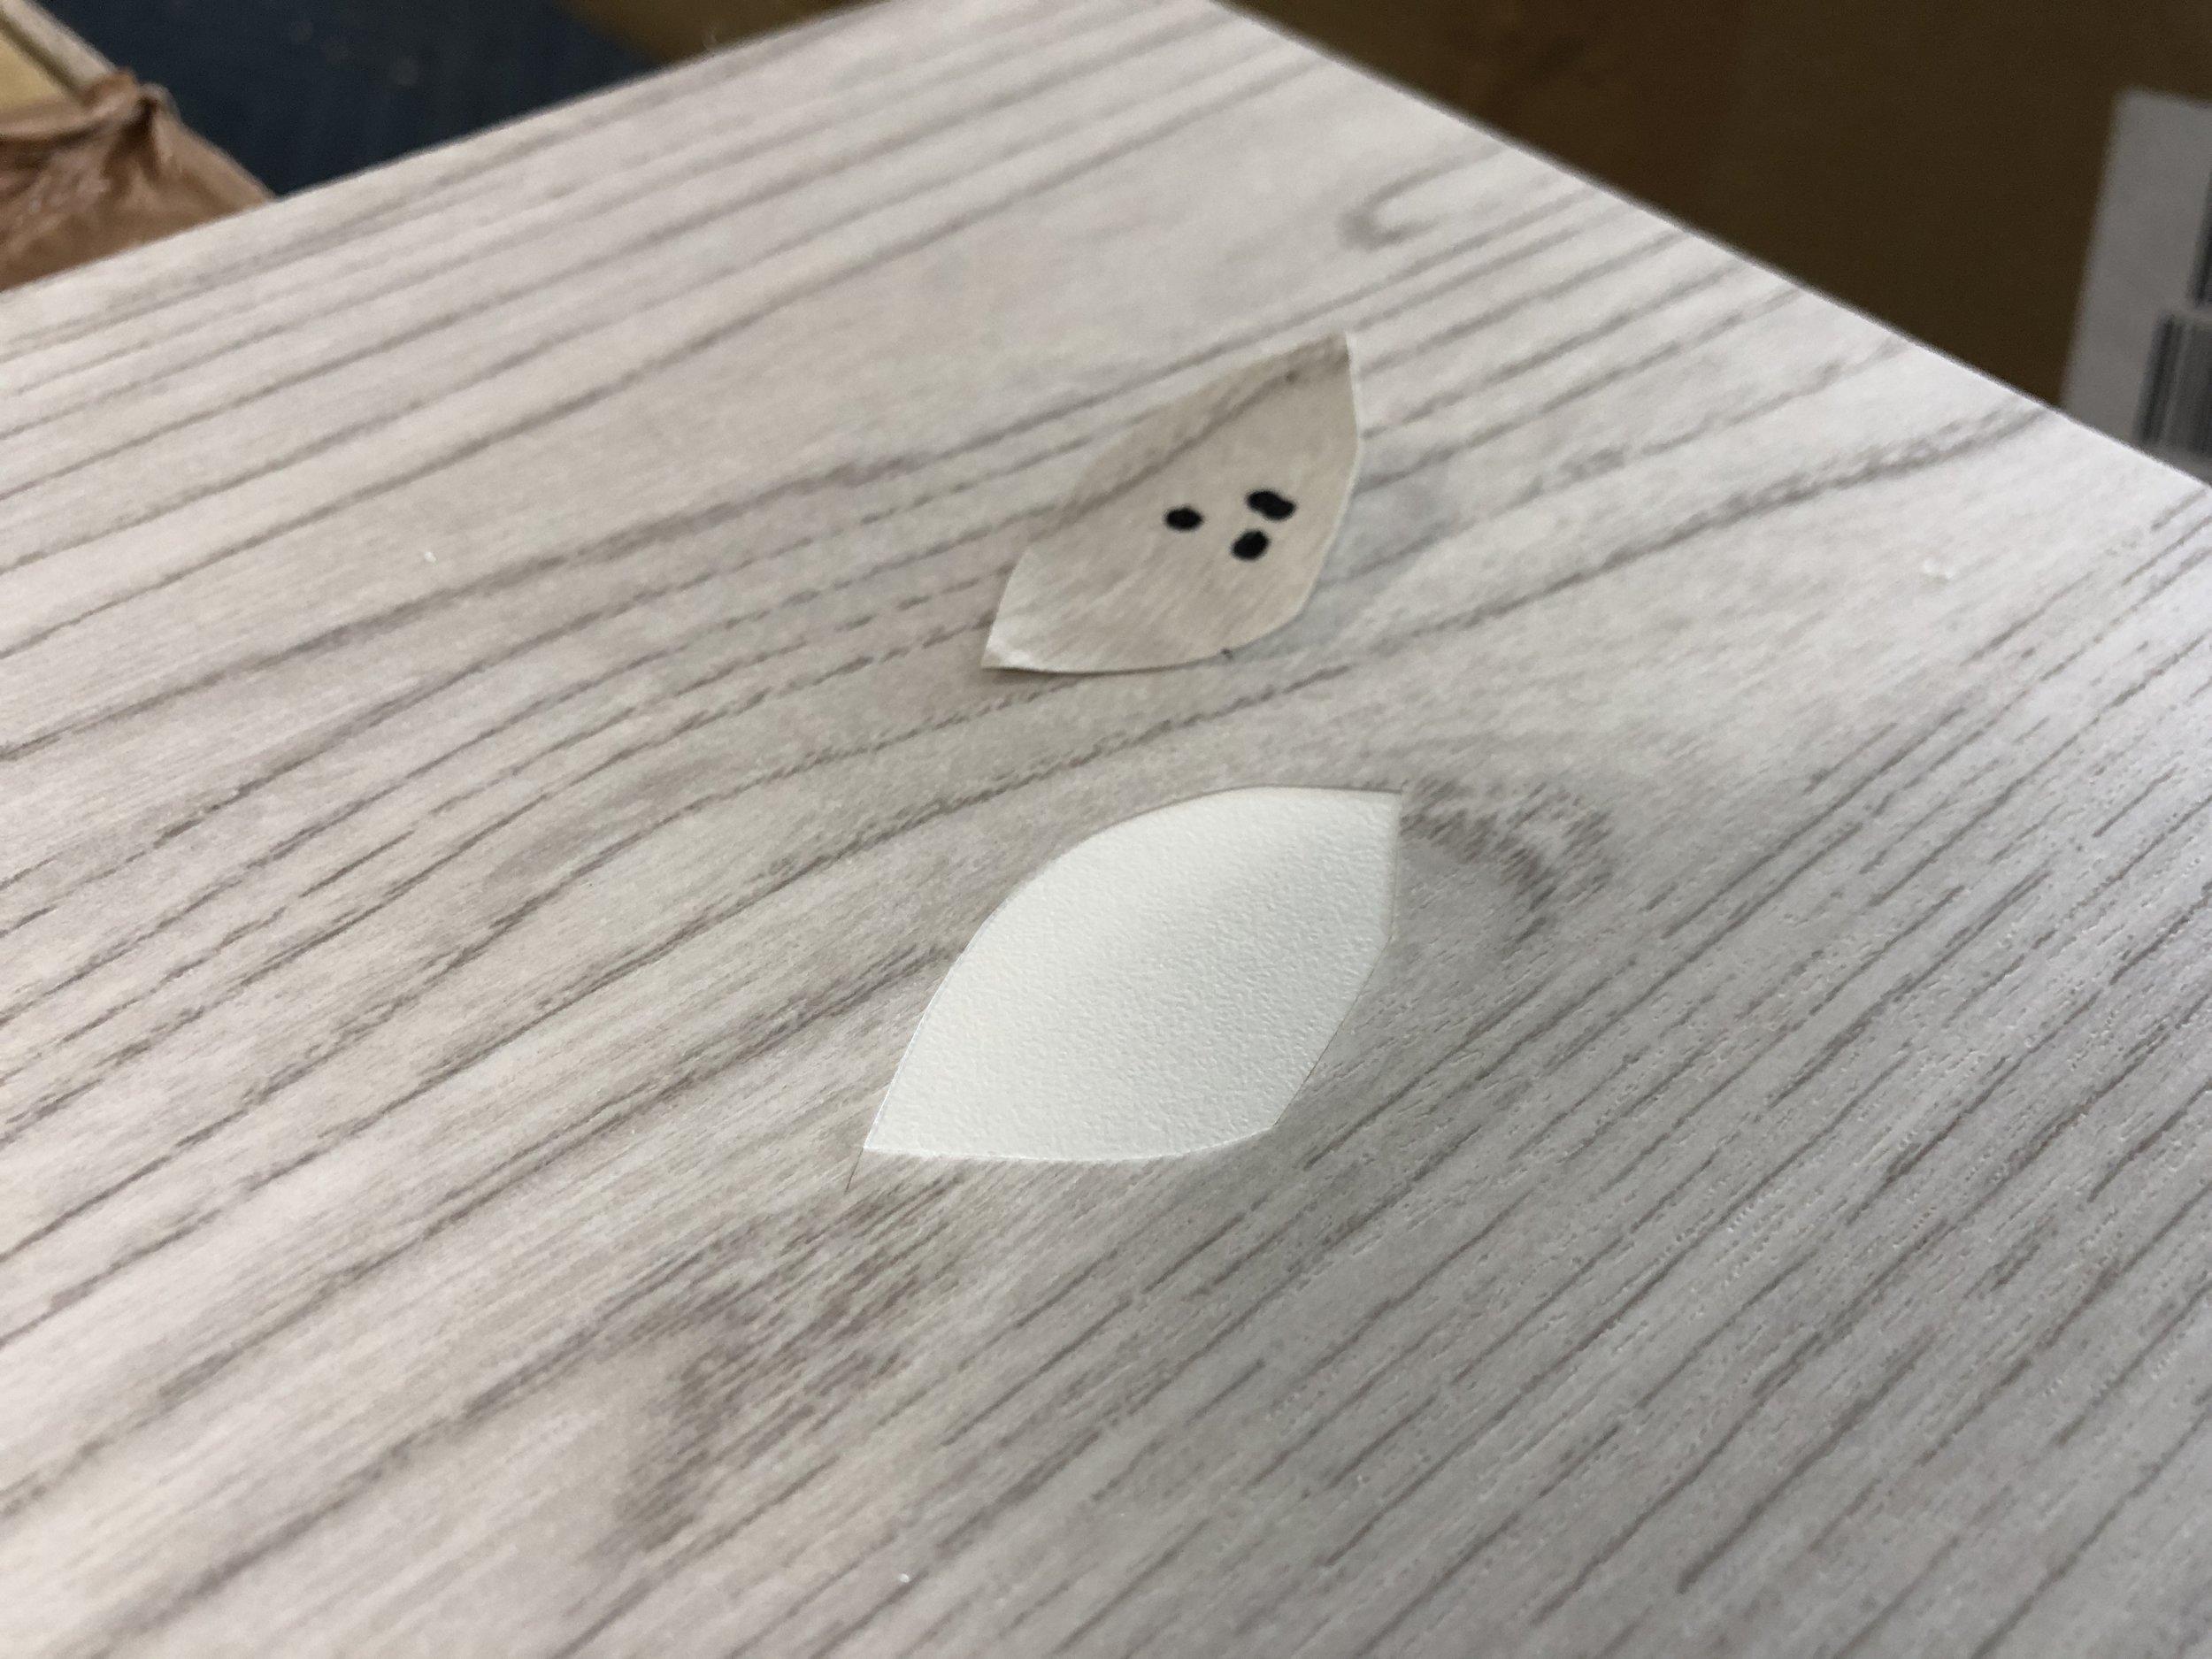 How to repair damaged vinyl